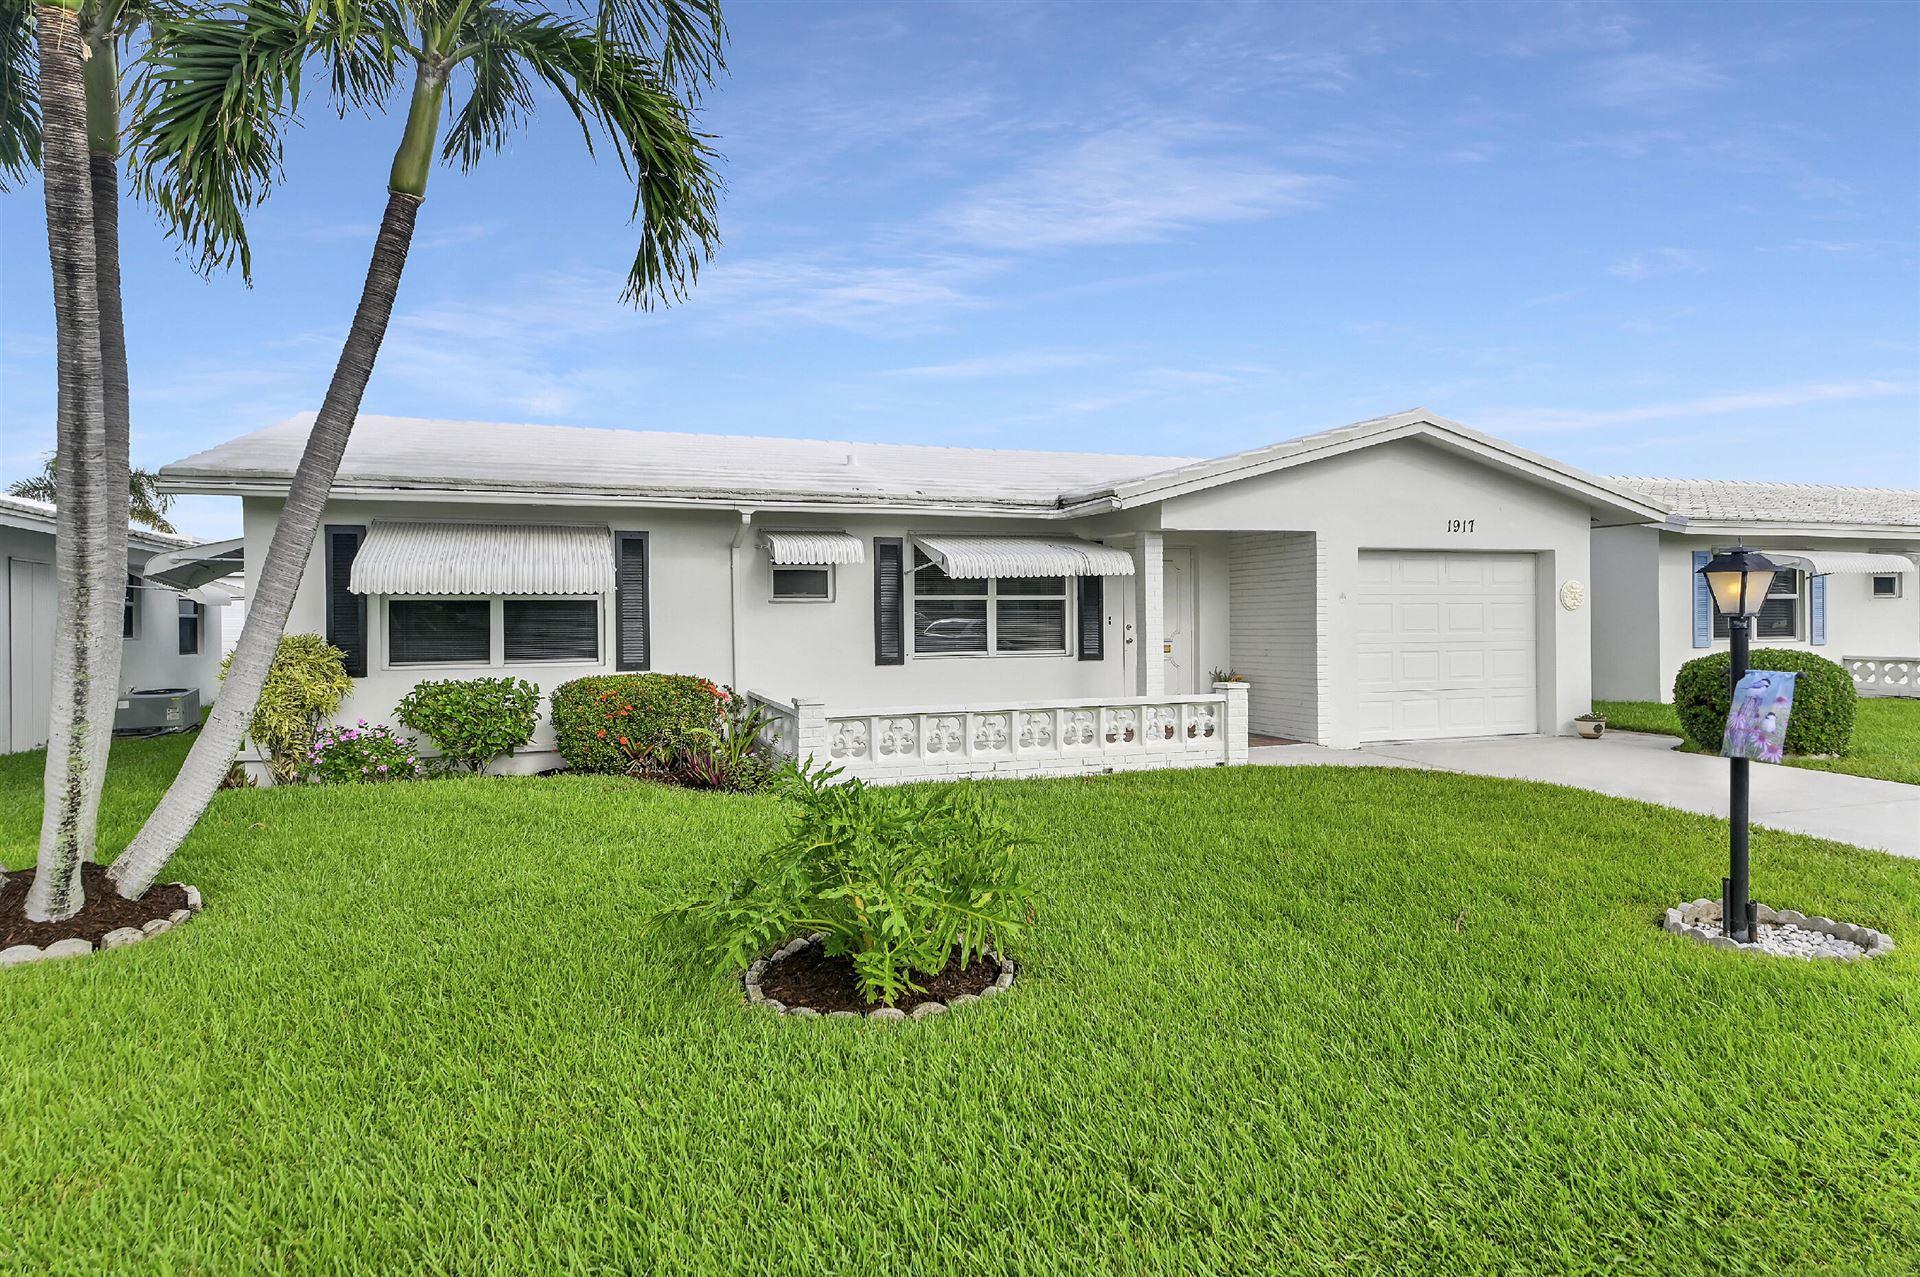 1917 SW 19th Street, Boynton Beach, FL 33426 - MLS#: RX-10752543